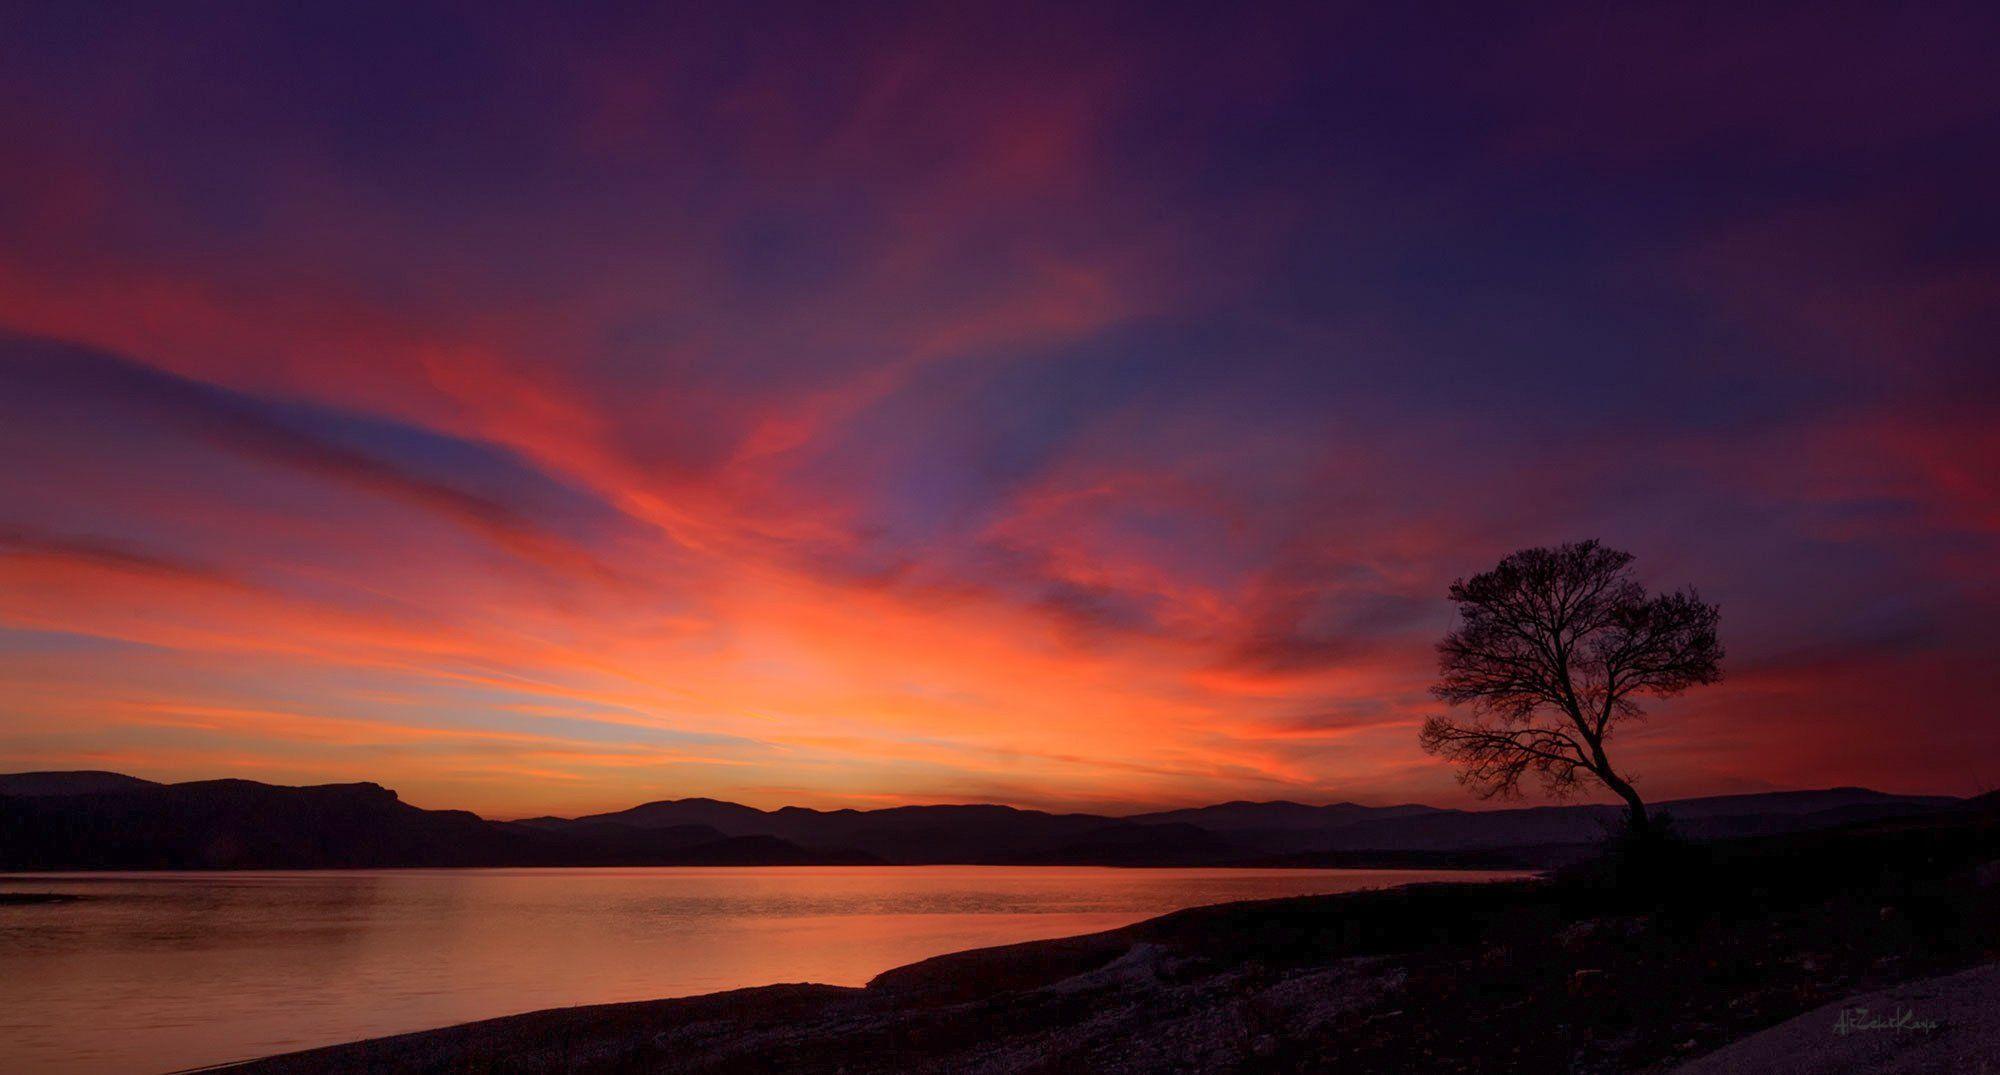 sunset ankara turkey landscape canon tree alone, Ali Zeki Kaya